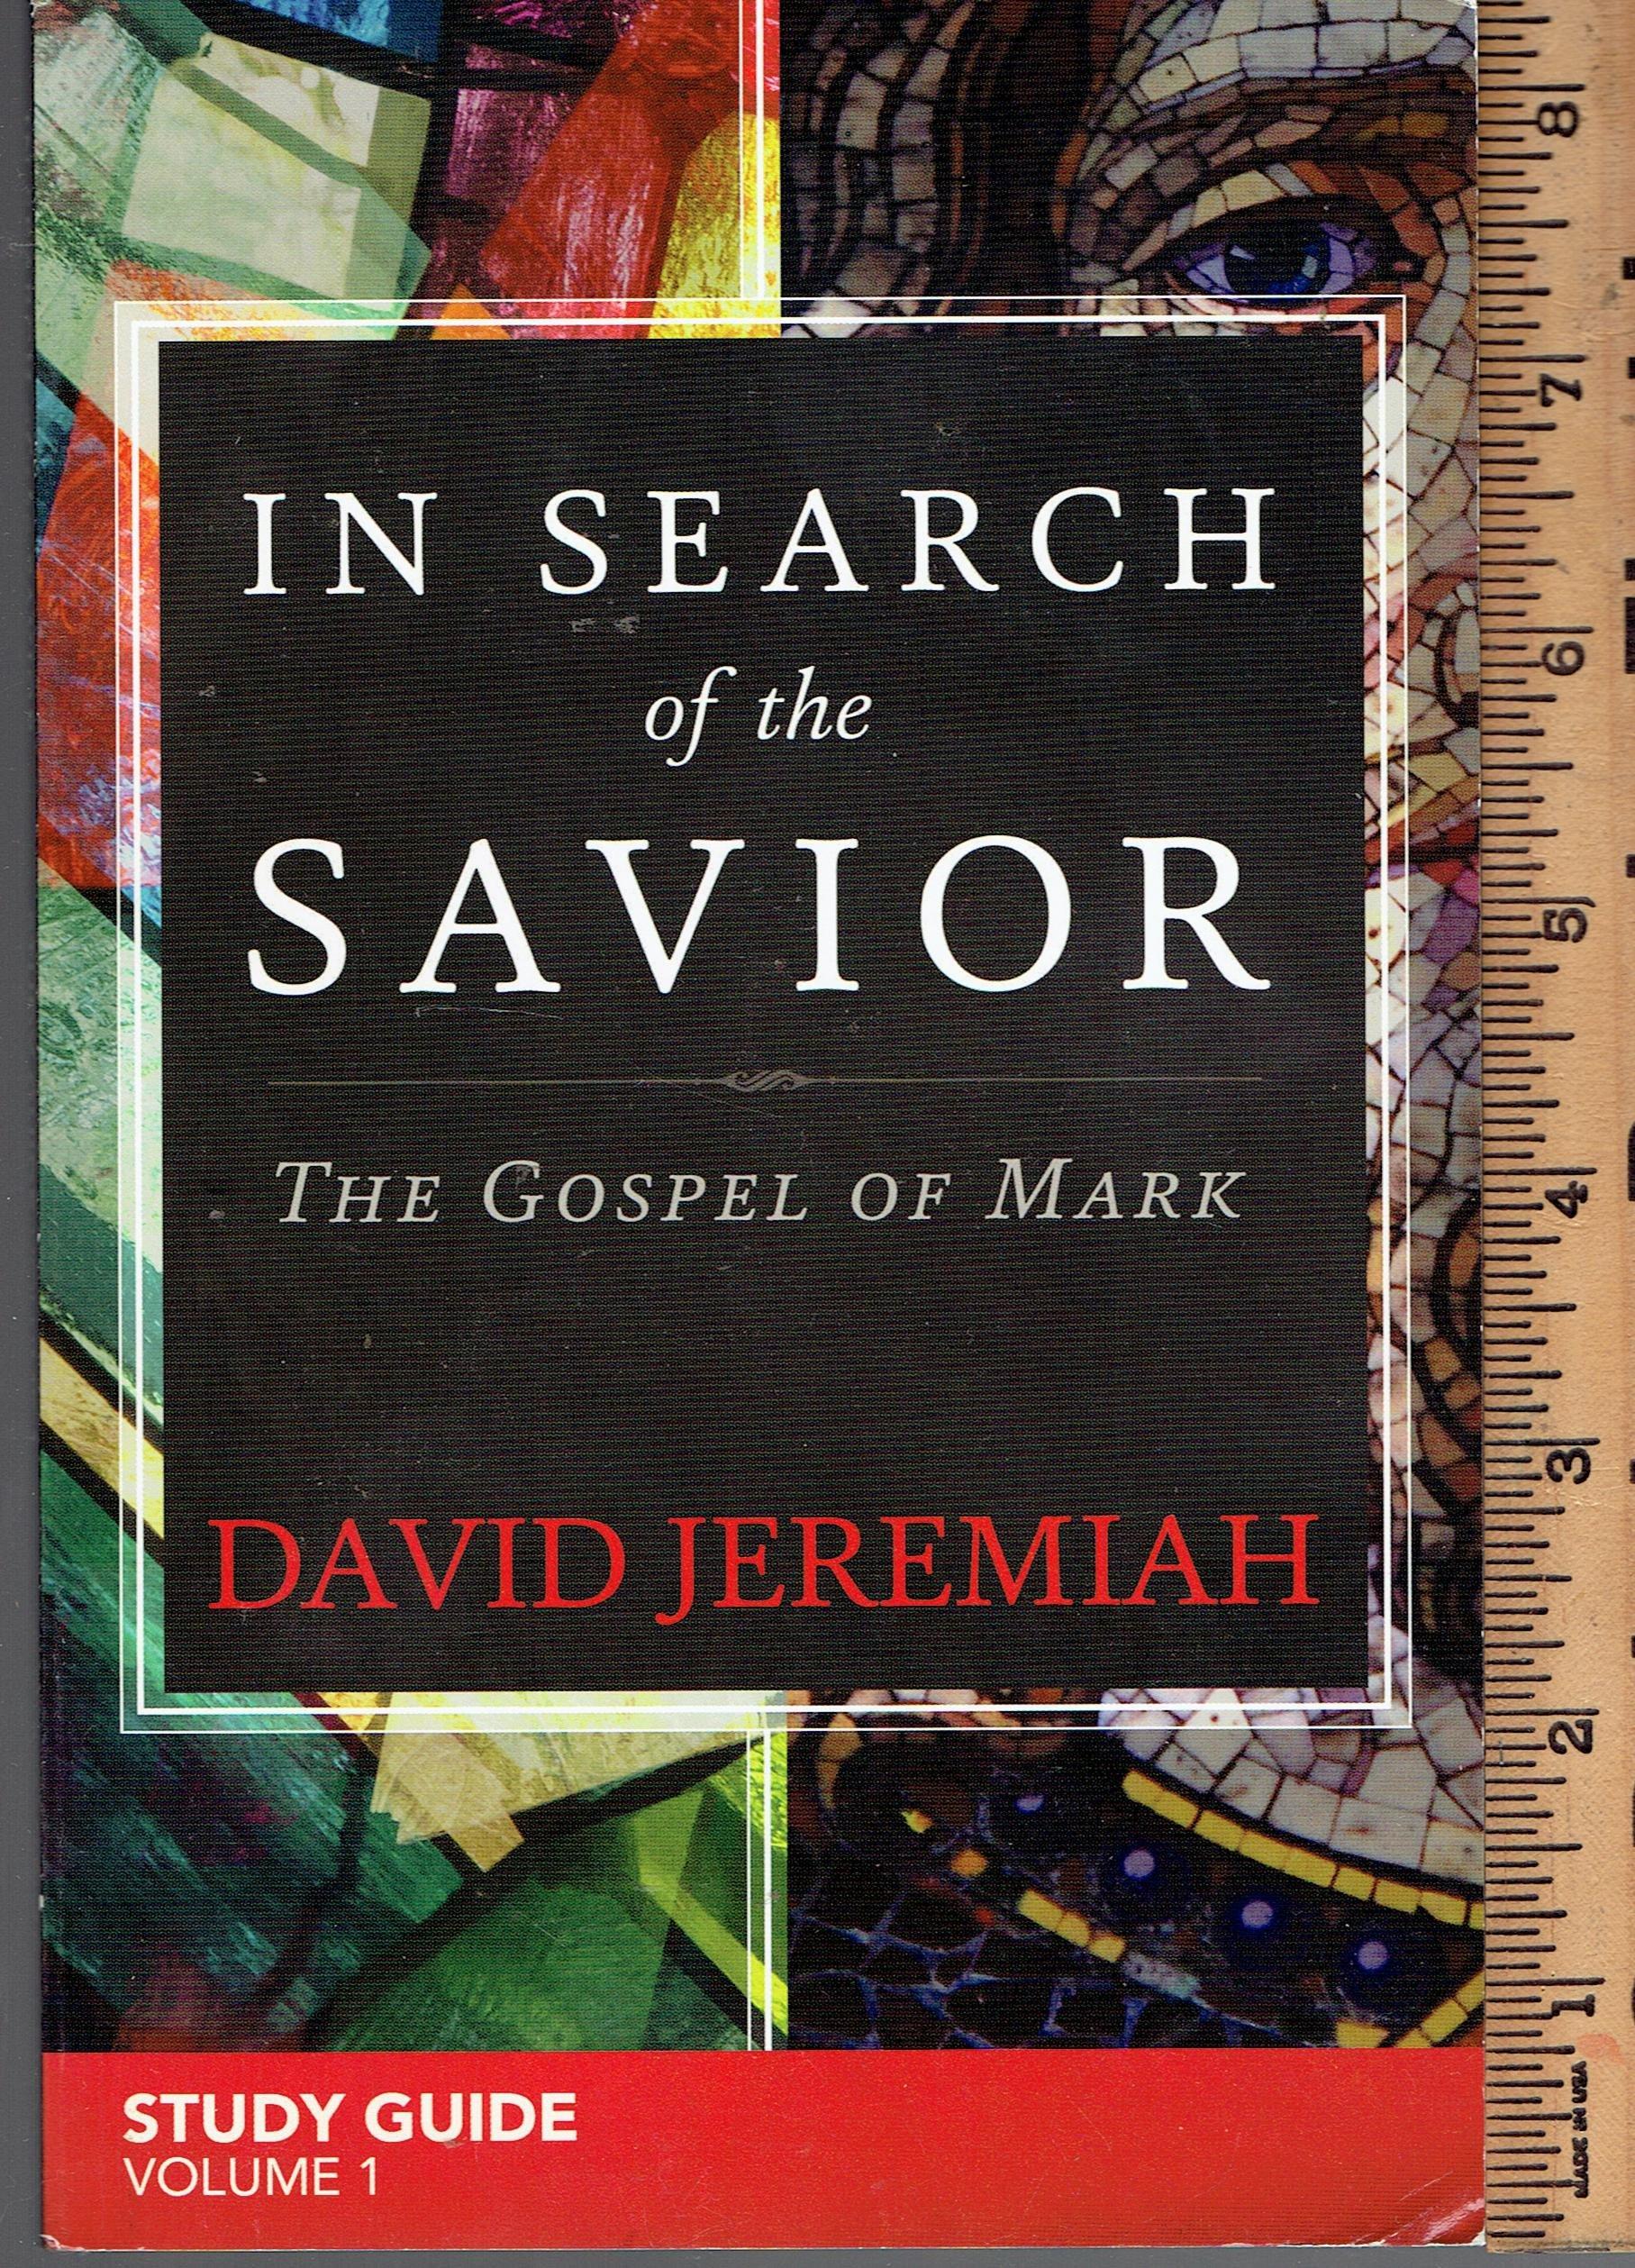 Download In Search of the Savior Study Guide Volume 1 pdf